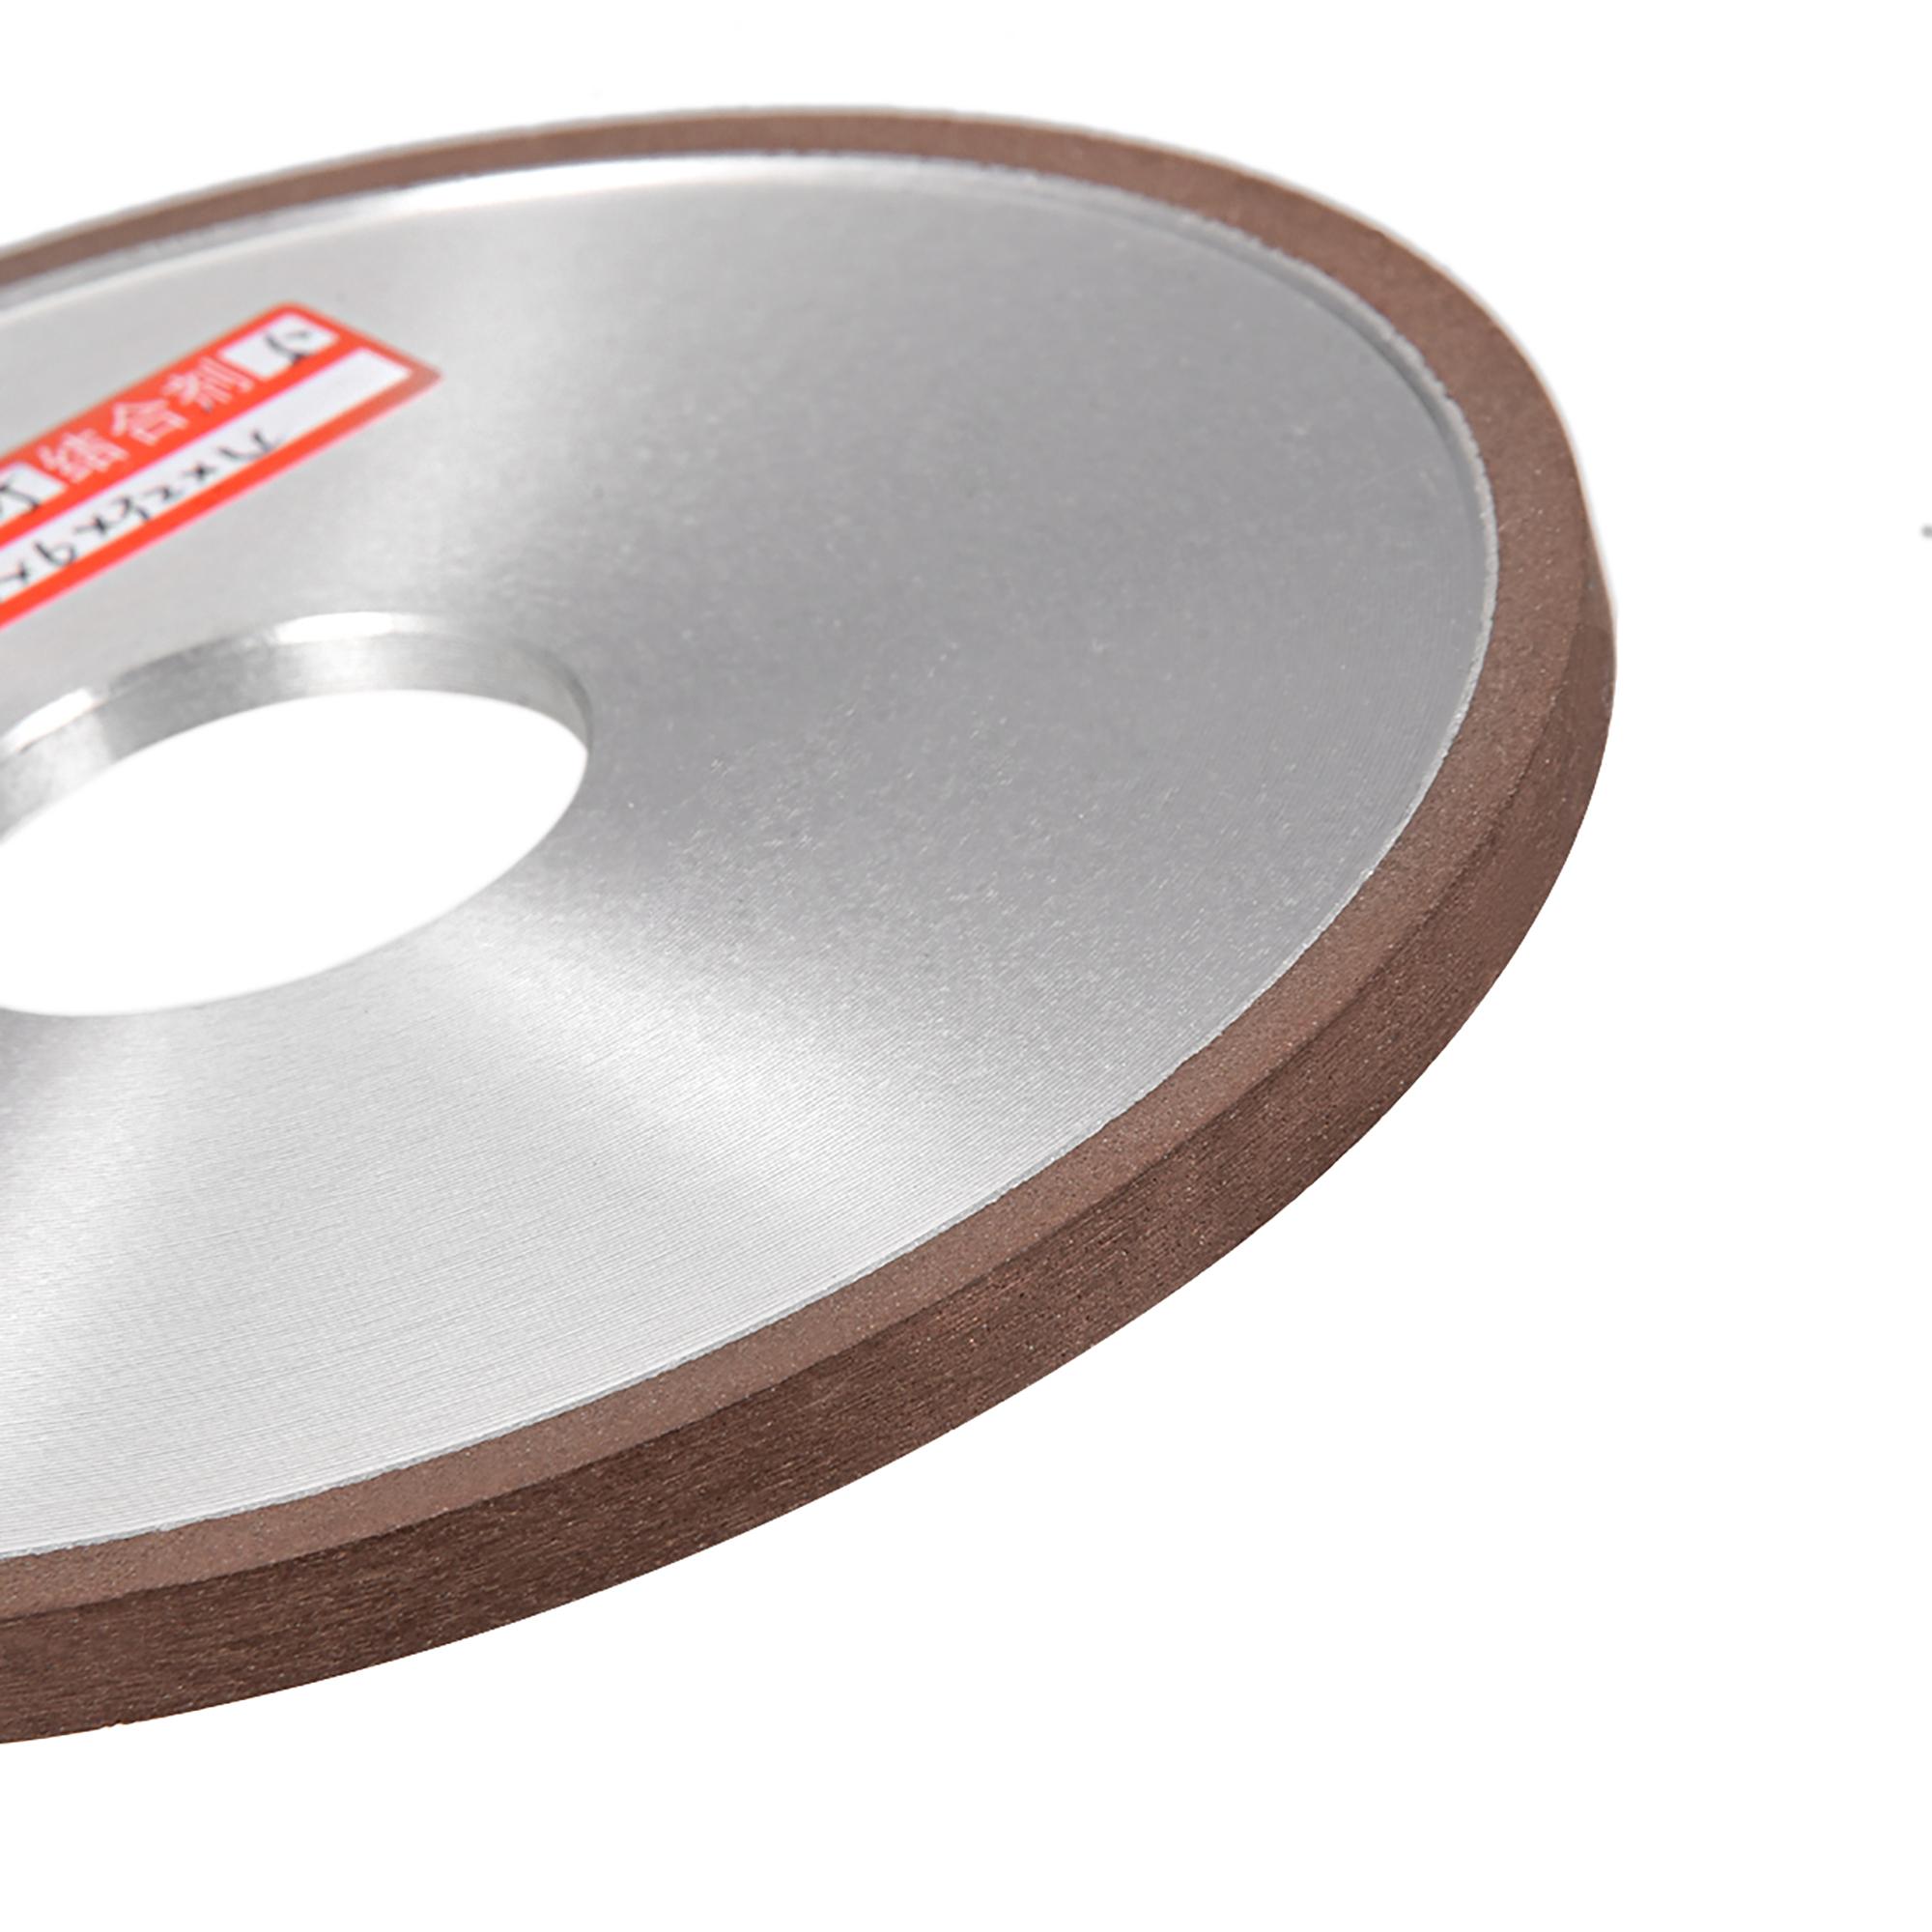 5-Inch Diamond Grinding Wheels Resin Bonded Flat Abrasive Wheel for Carbide Metal 150 Grits 75% - image 2 de 3